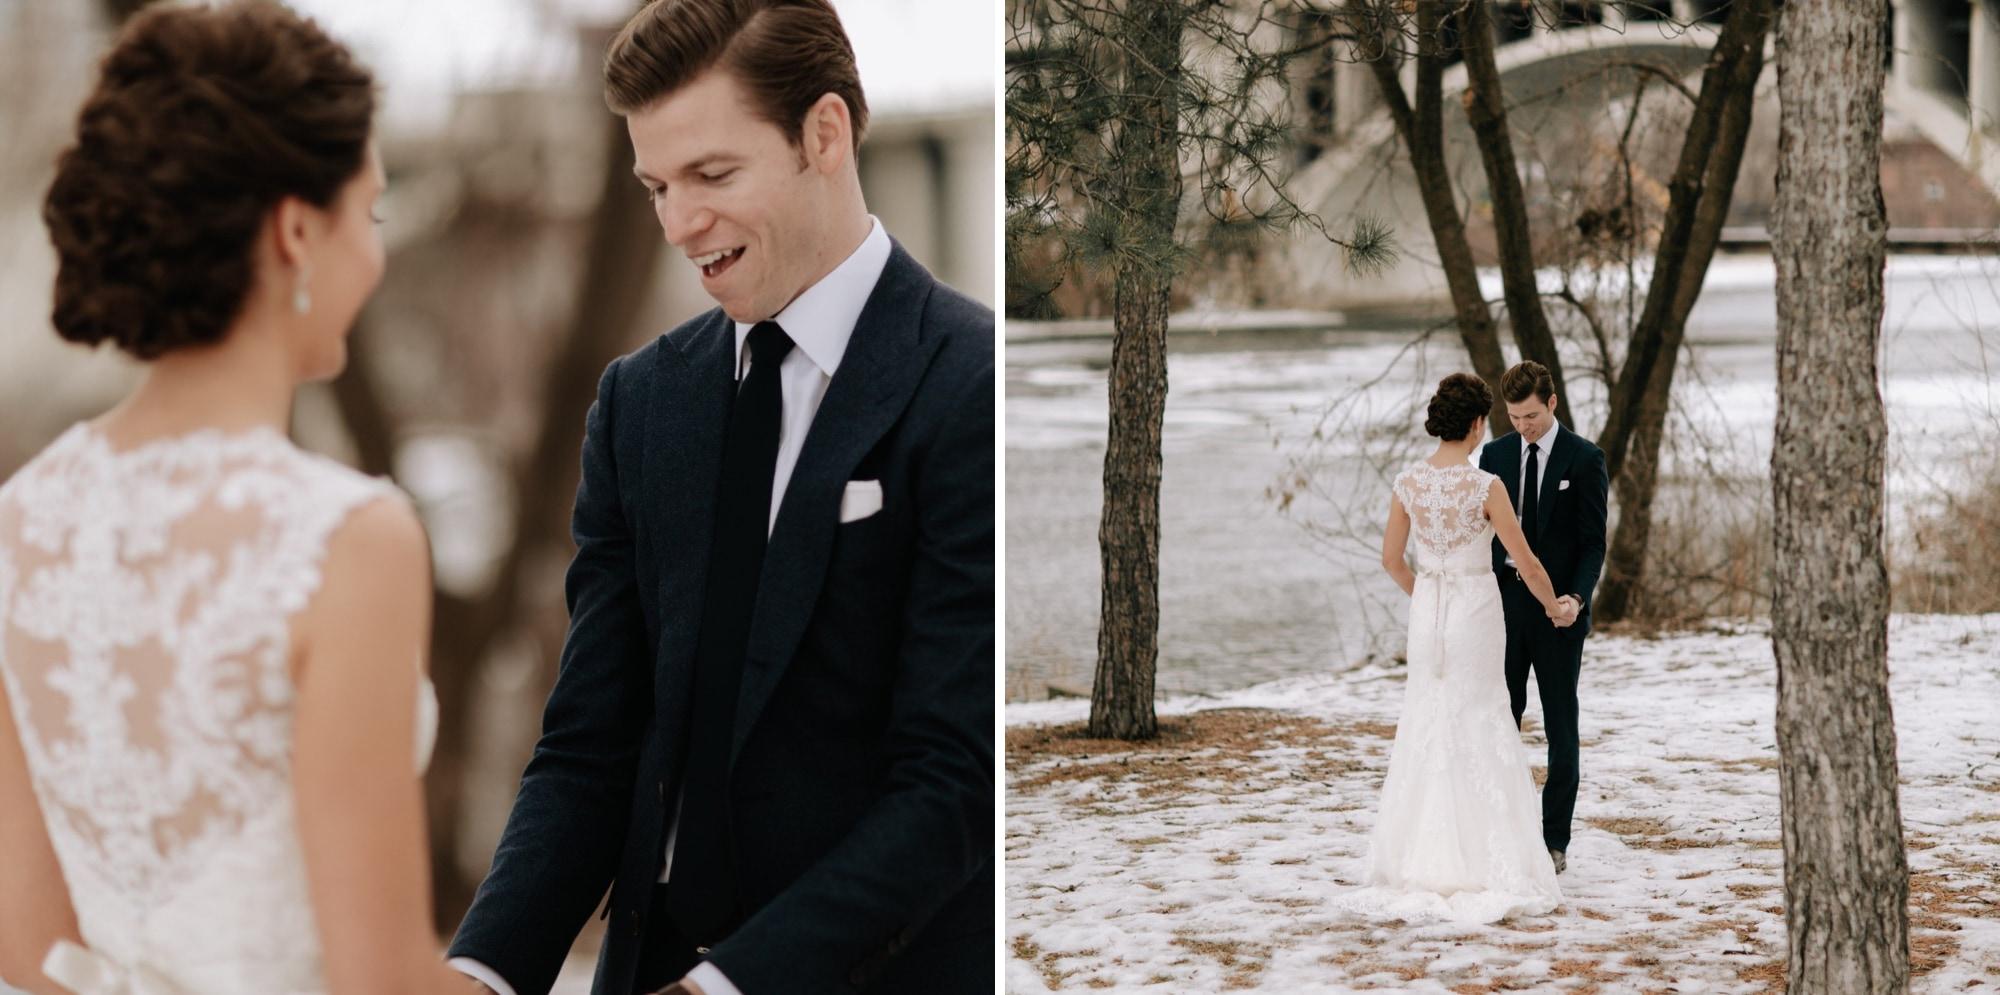 Nicollet-Island-Pavilion-Winter-Wedding-Minneapolis_17.jpg